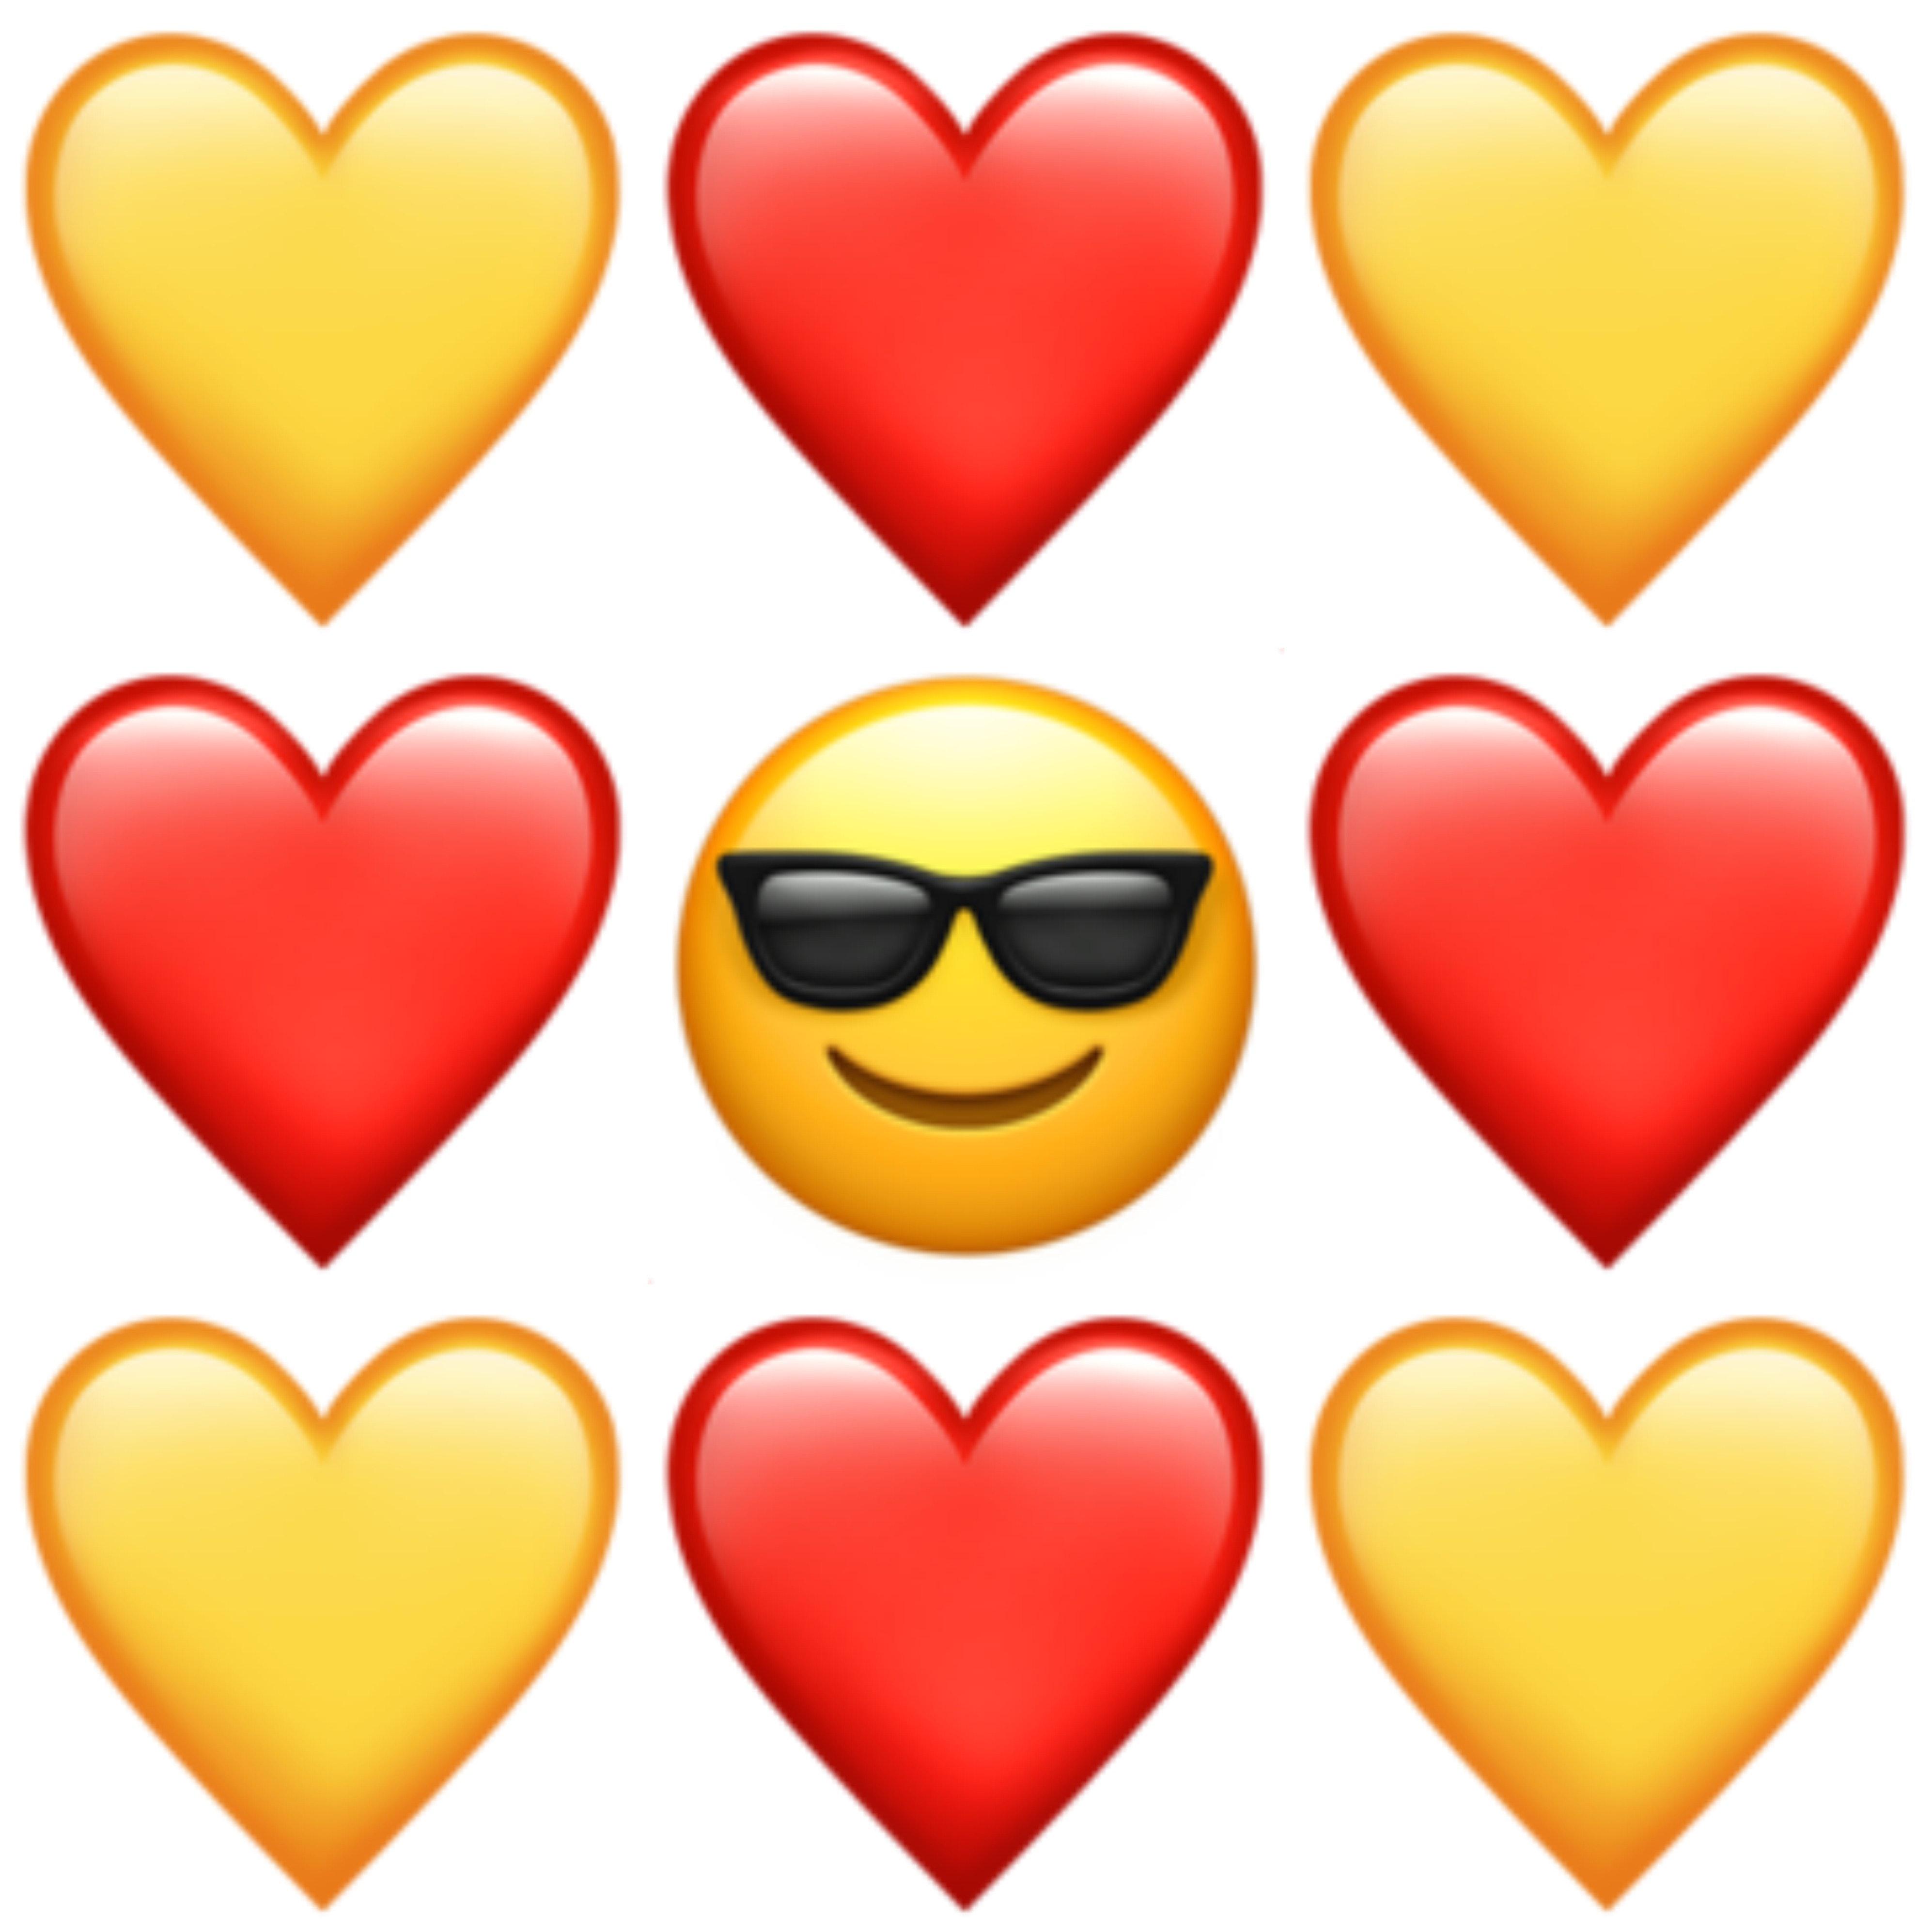 What do the friend emoji on snapchat mean these symbols show what do the friend emoji on snapchat mean these symbols show where you stand with your besties buycottarizona